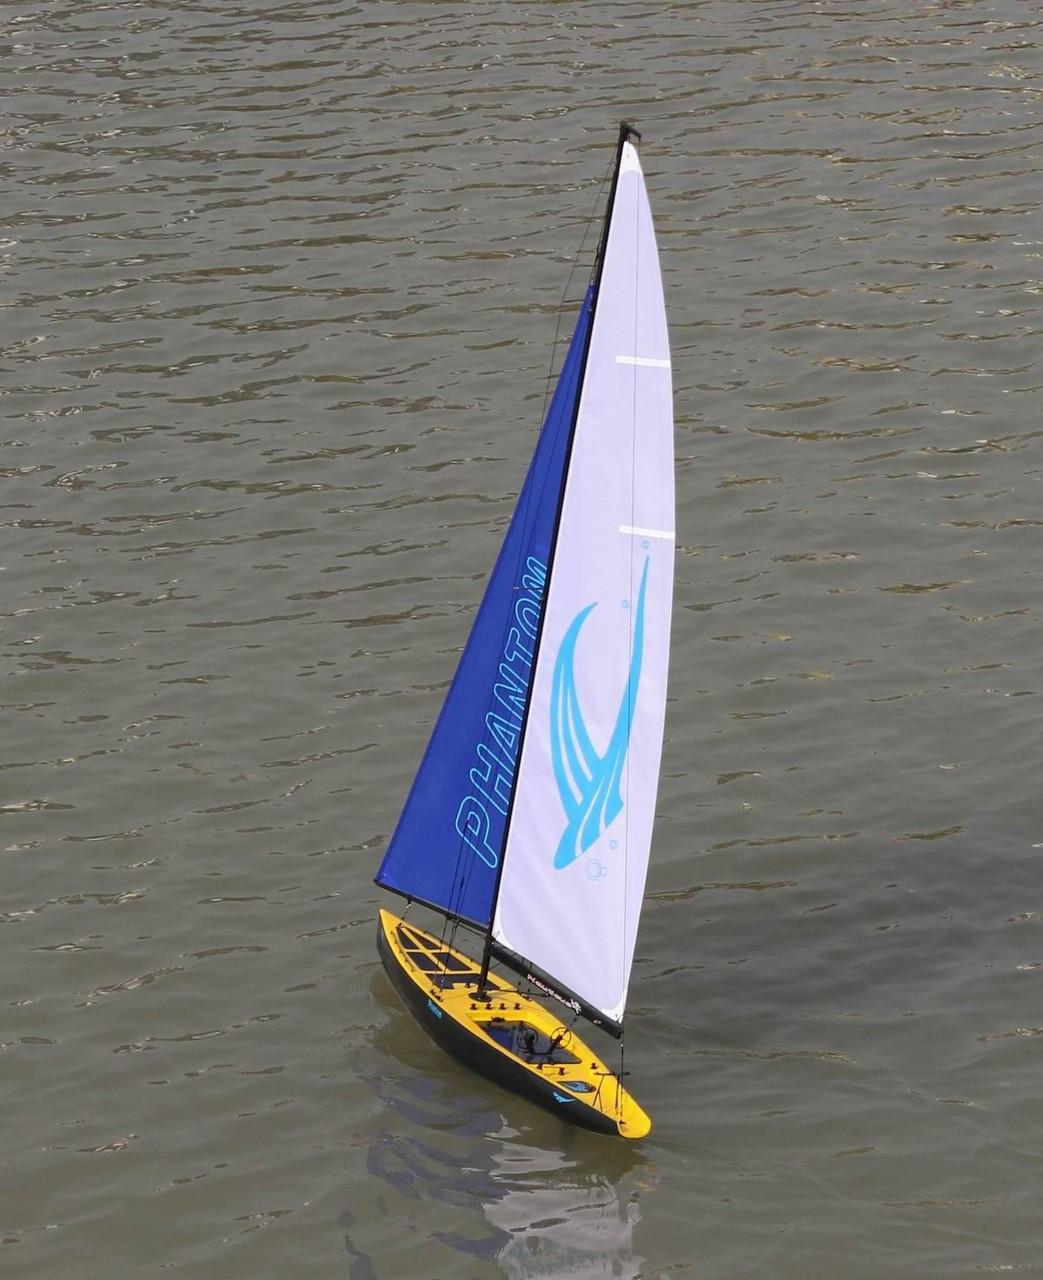 Phantom RC Sail Boat Racing Yacht  Sailboat 2.4G Radio Remote Control RTR